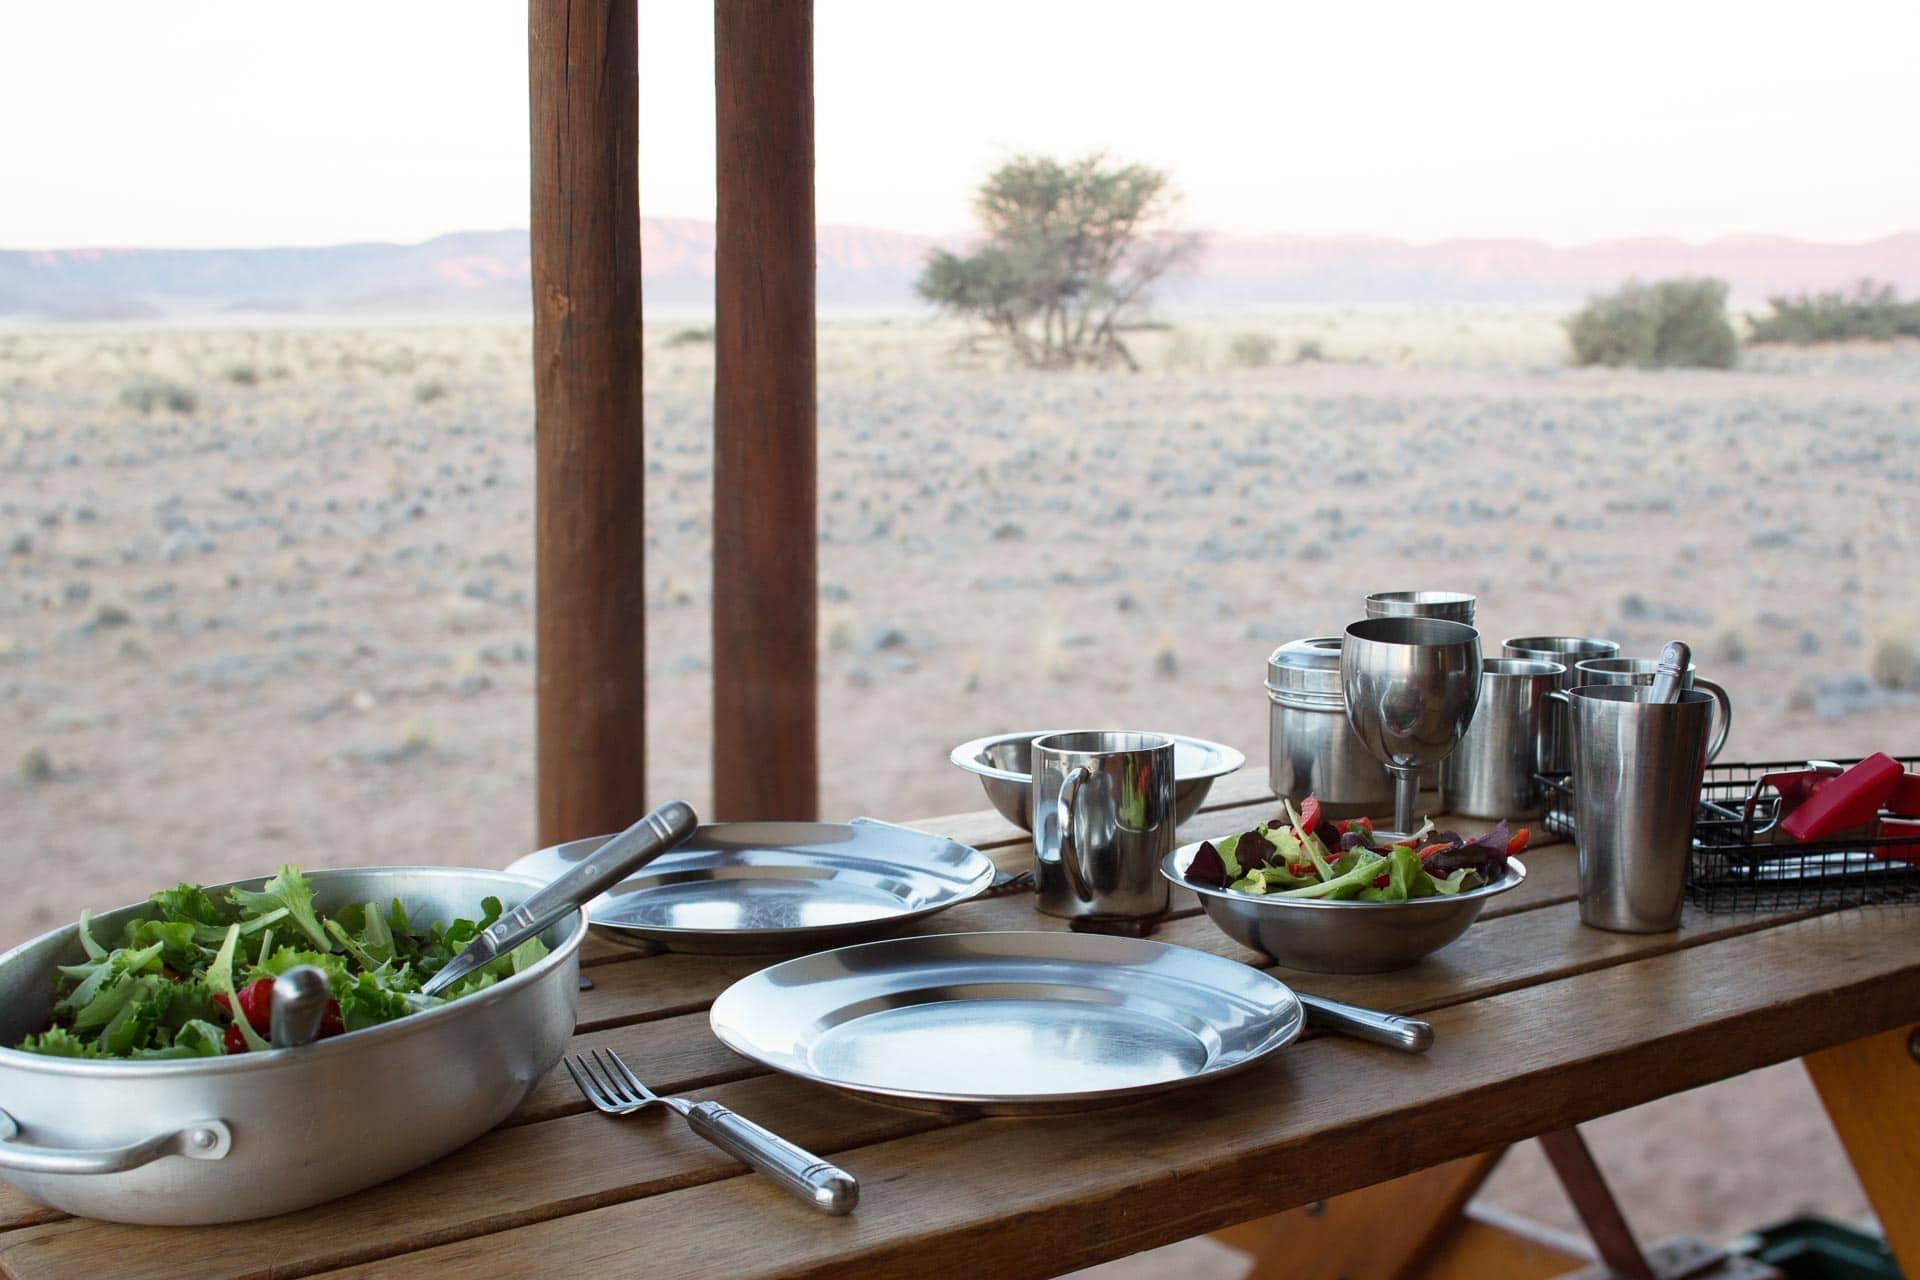 Desert-Camp-Namibia-2